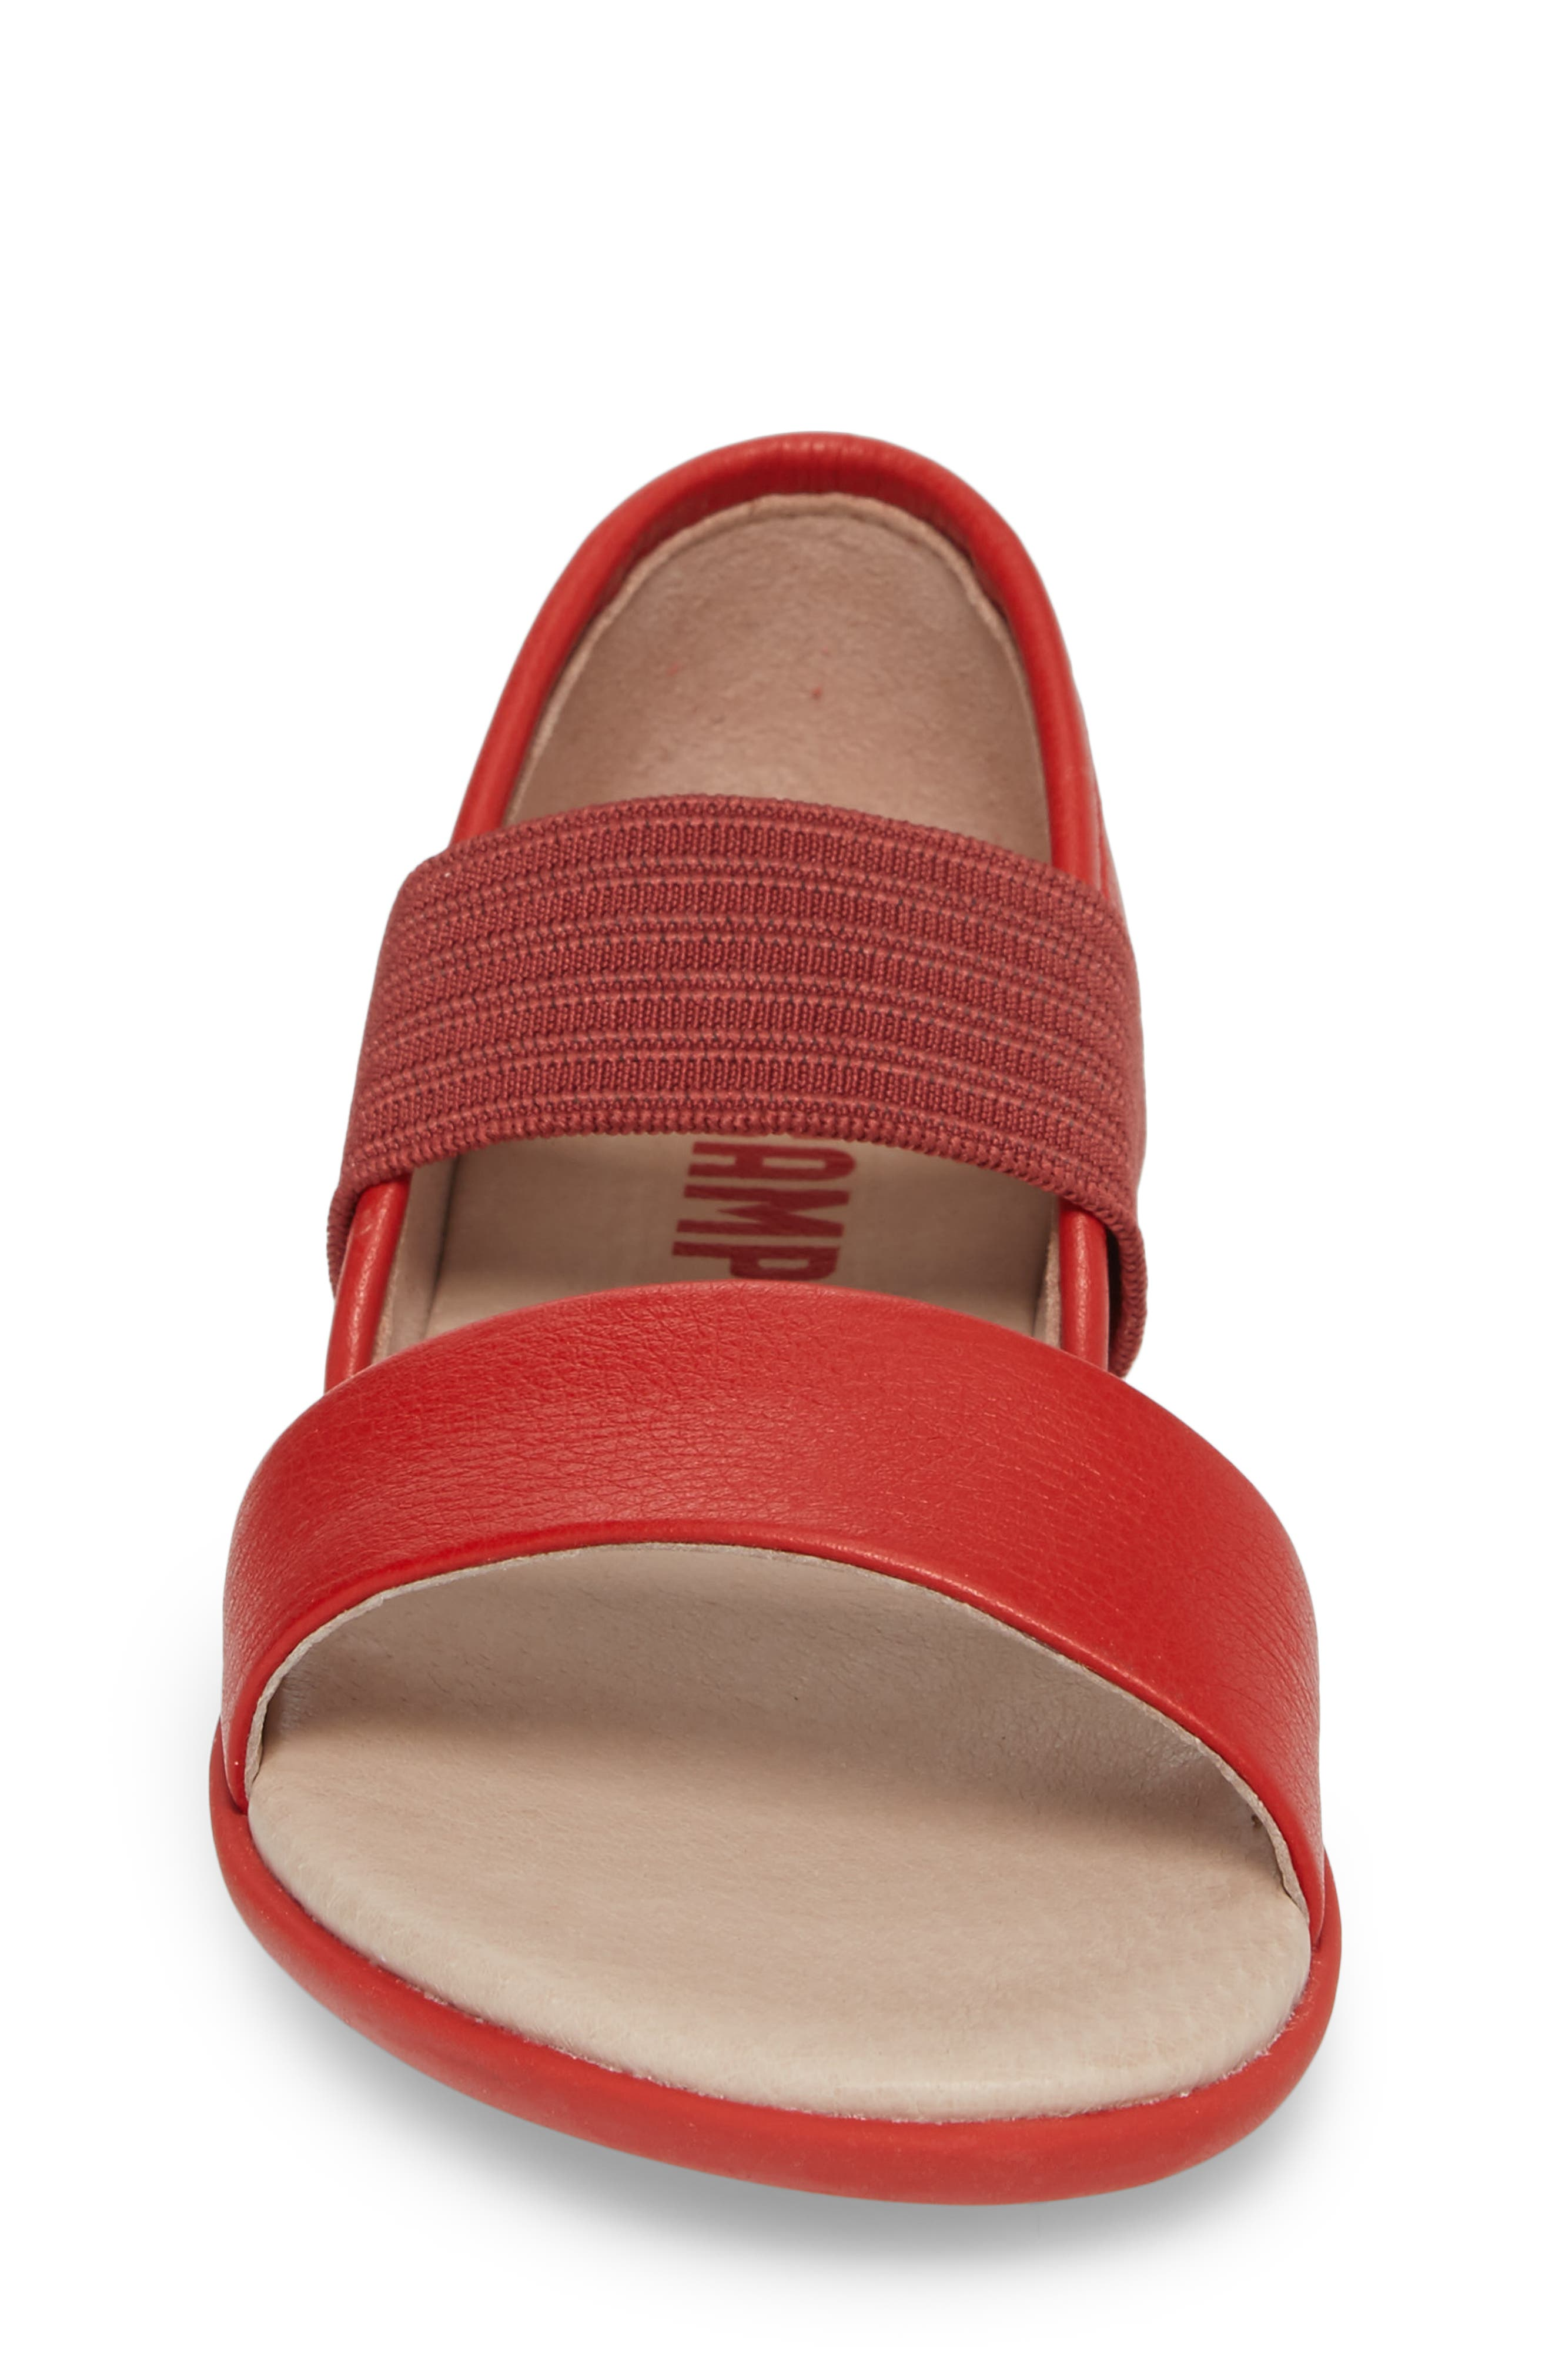 Right Sandal,                             Alternate thumbnail 4, color,                             Red